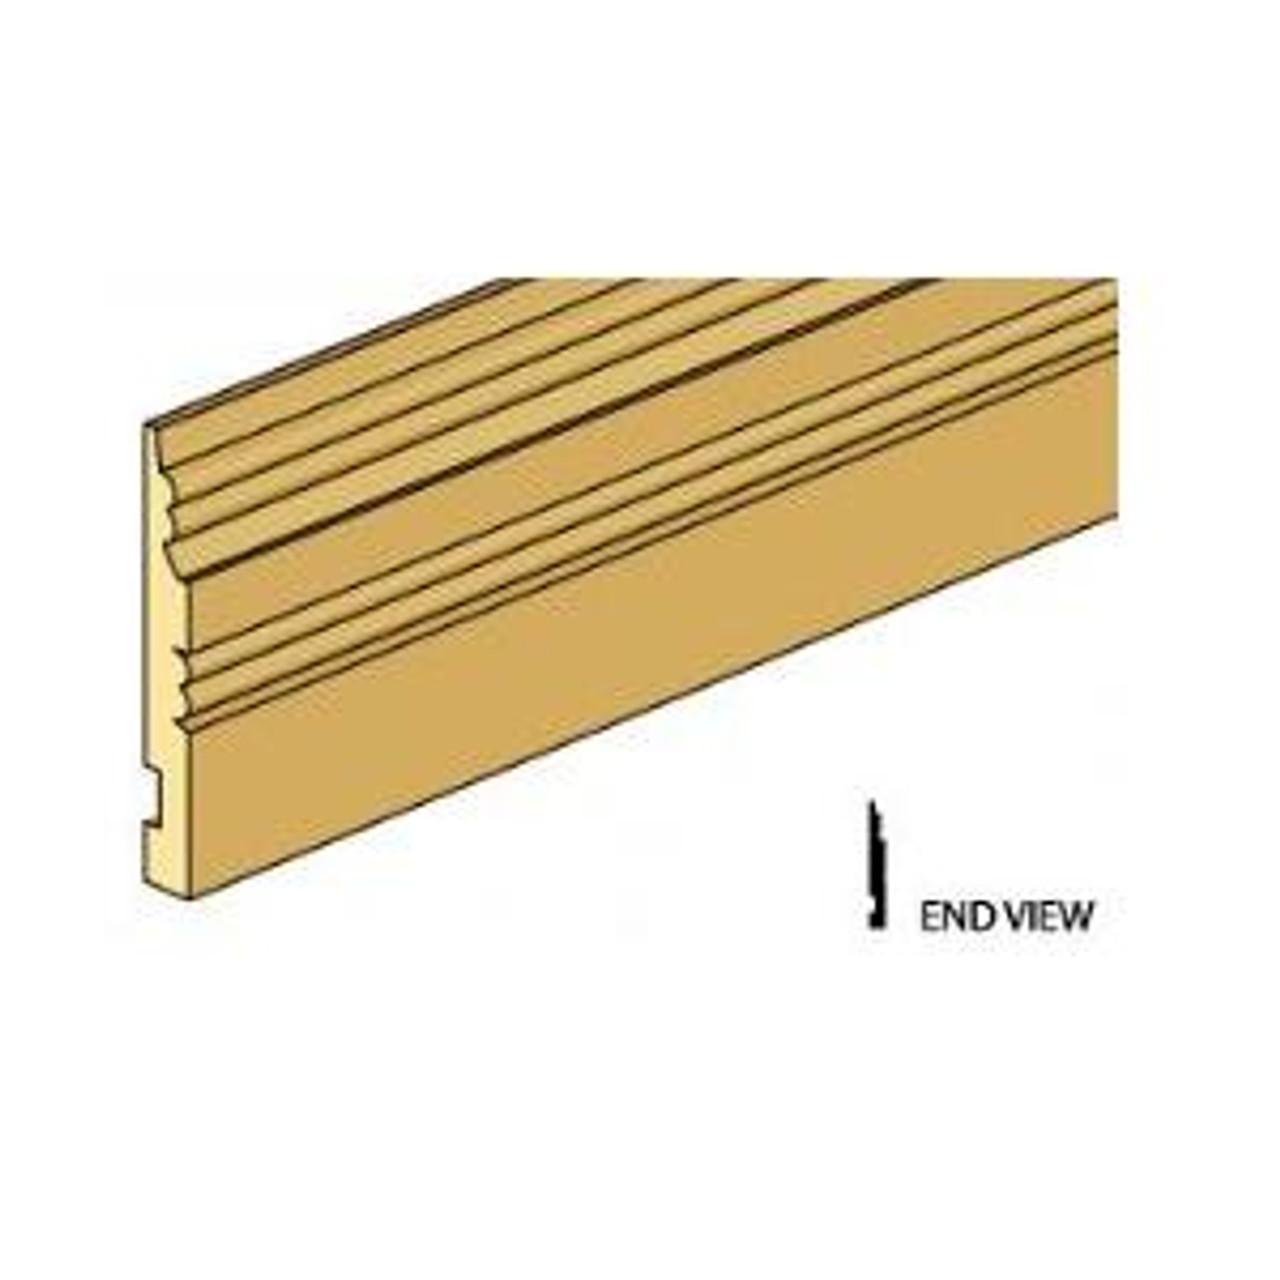 Baseboard (CLA77946) detail illustration